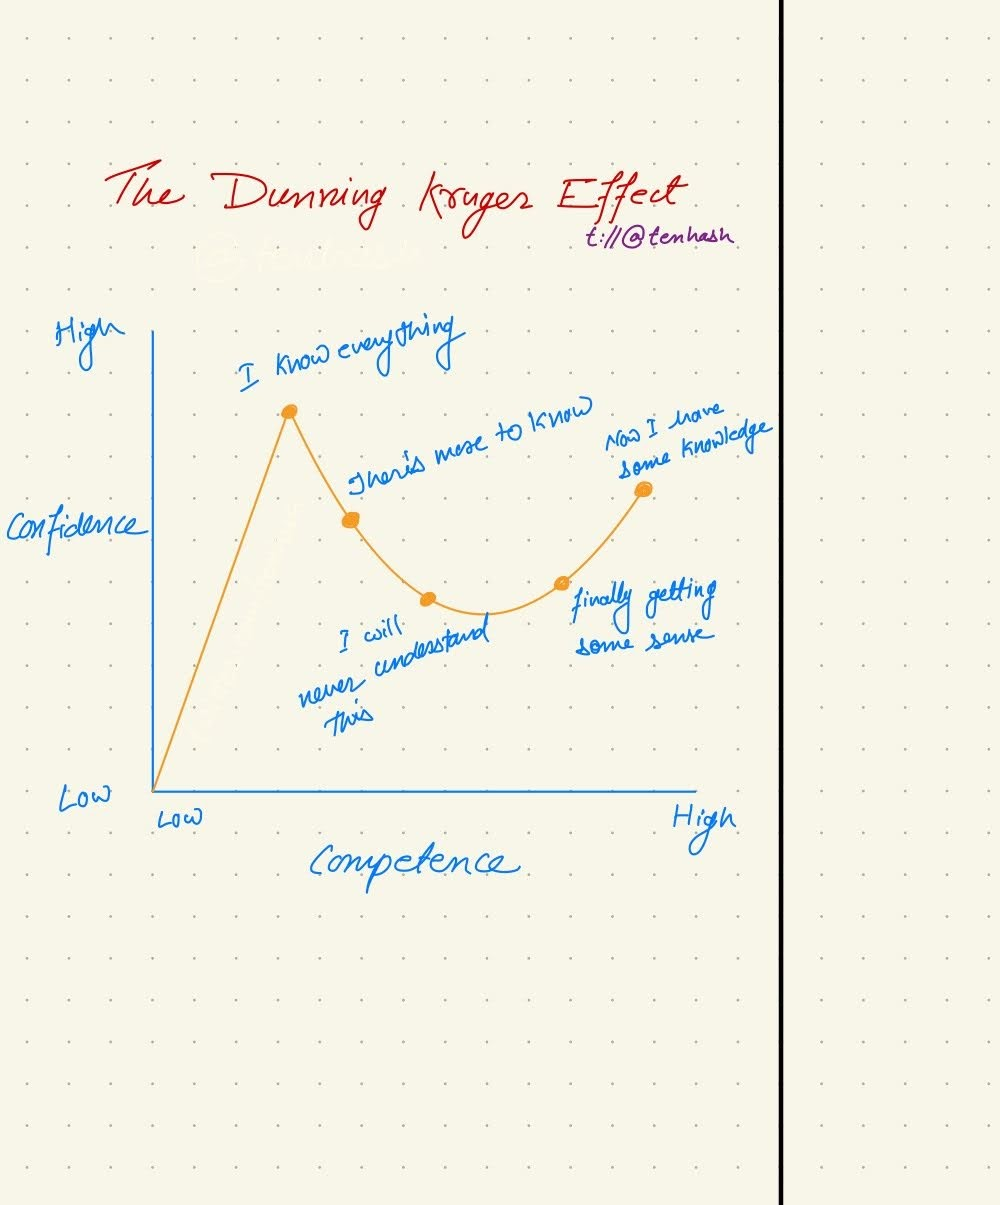 The Dunning Kruger effect